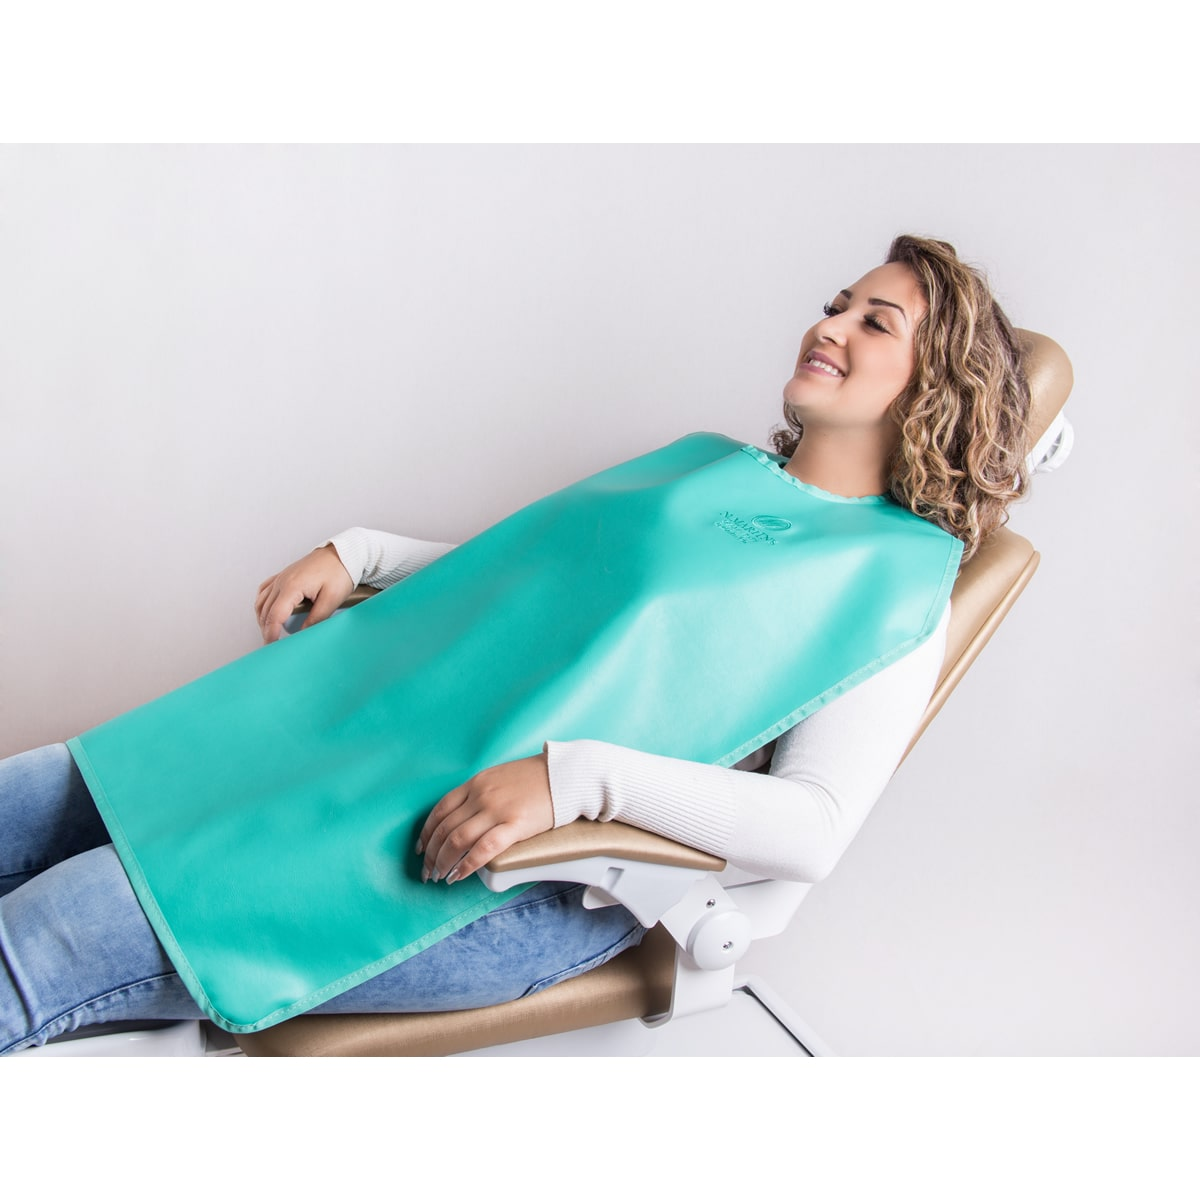 Avental Periapical sem protetor de tireoide - 76x60cm - 0,50mm/Pb - N.Martins